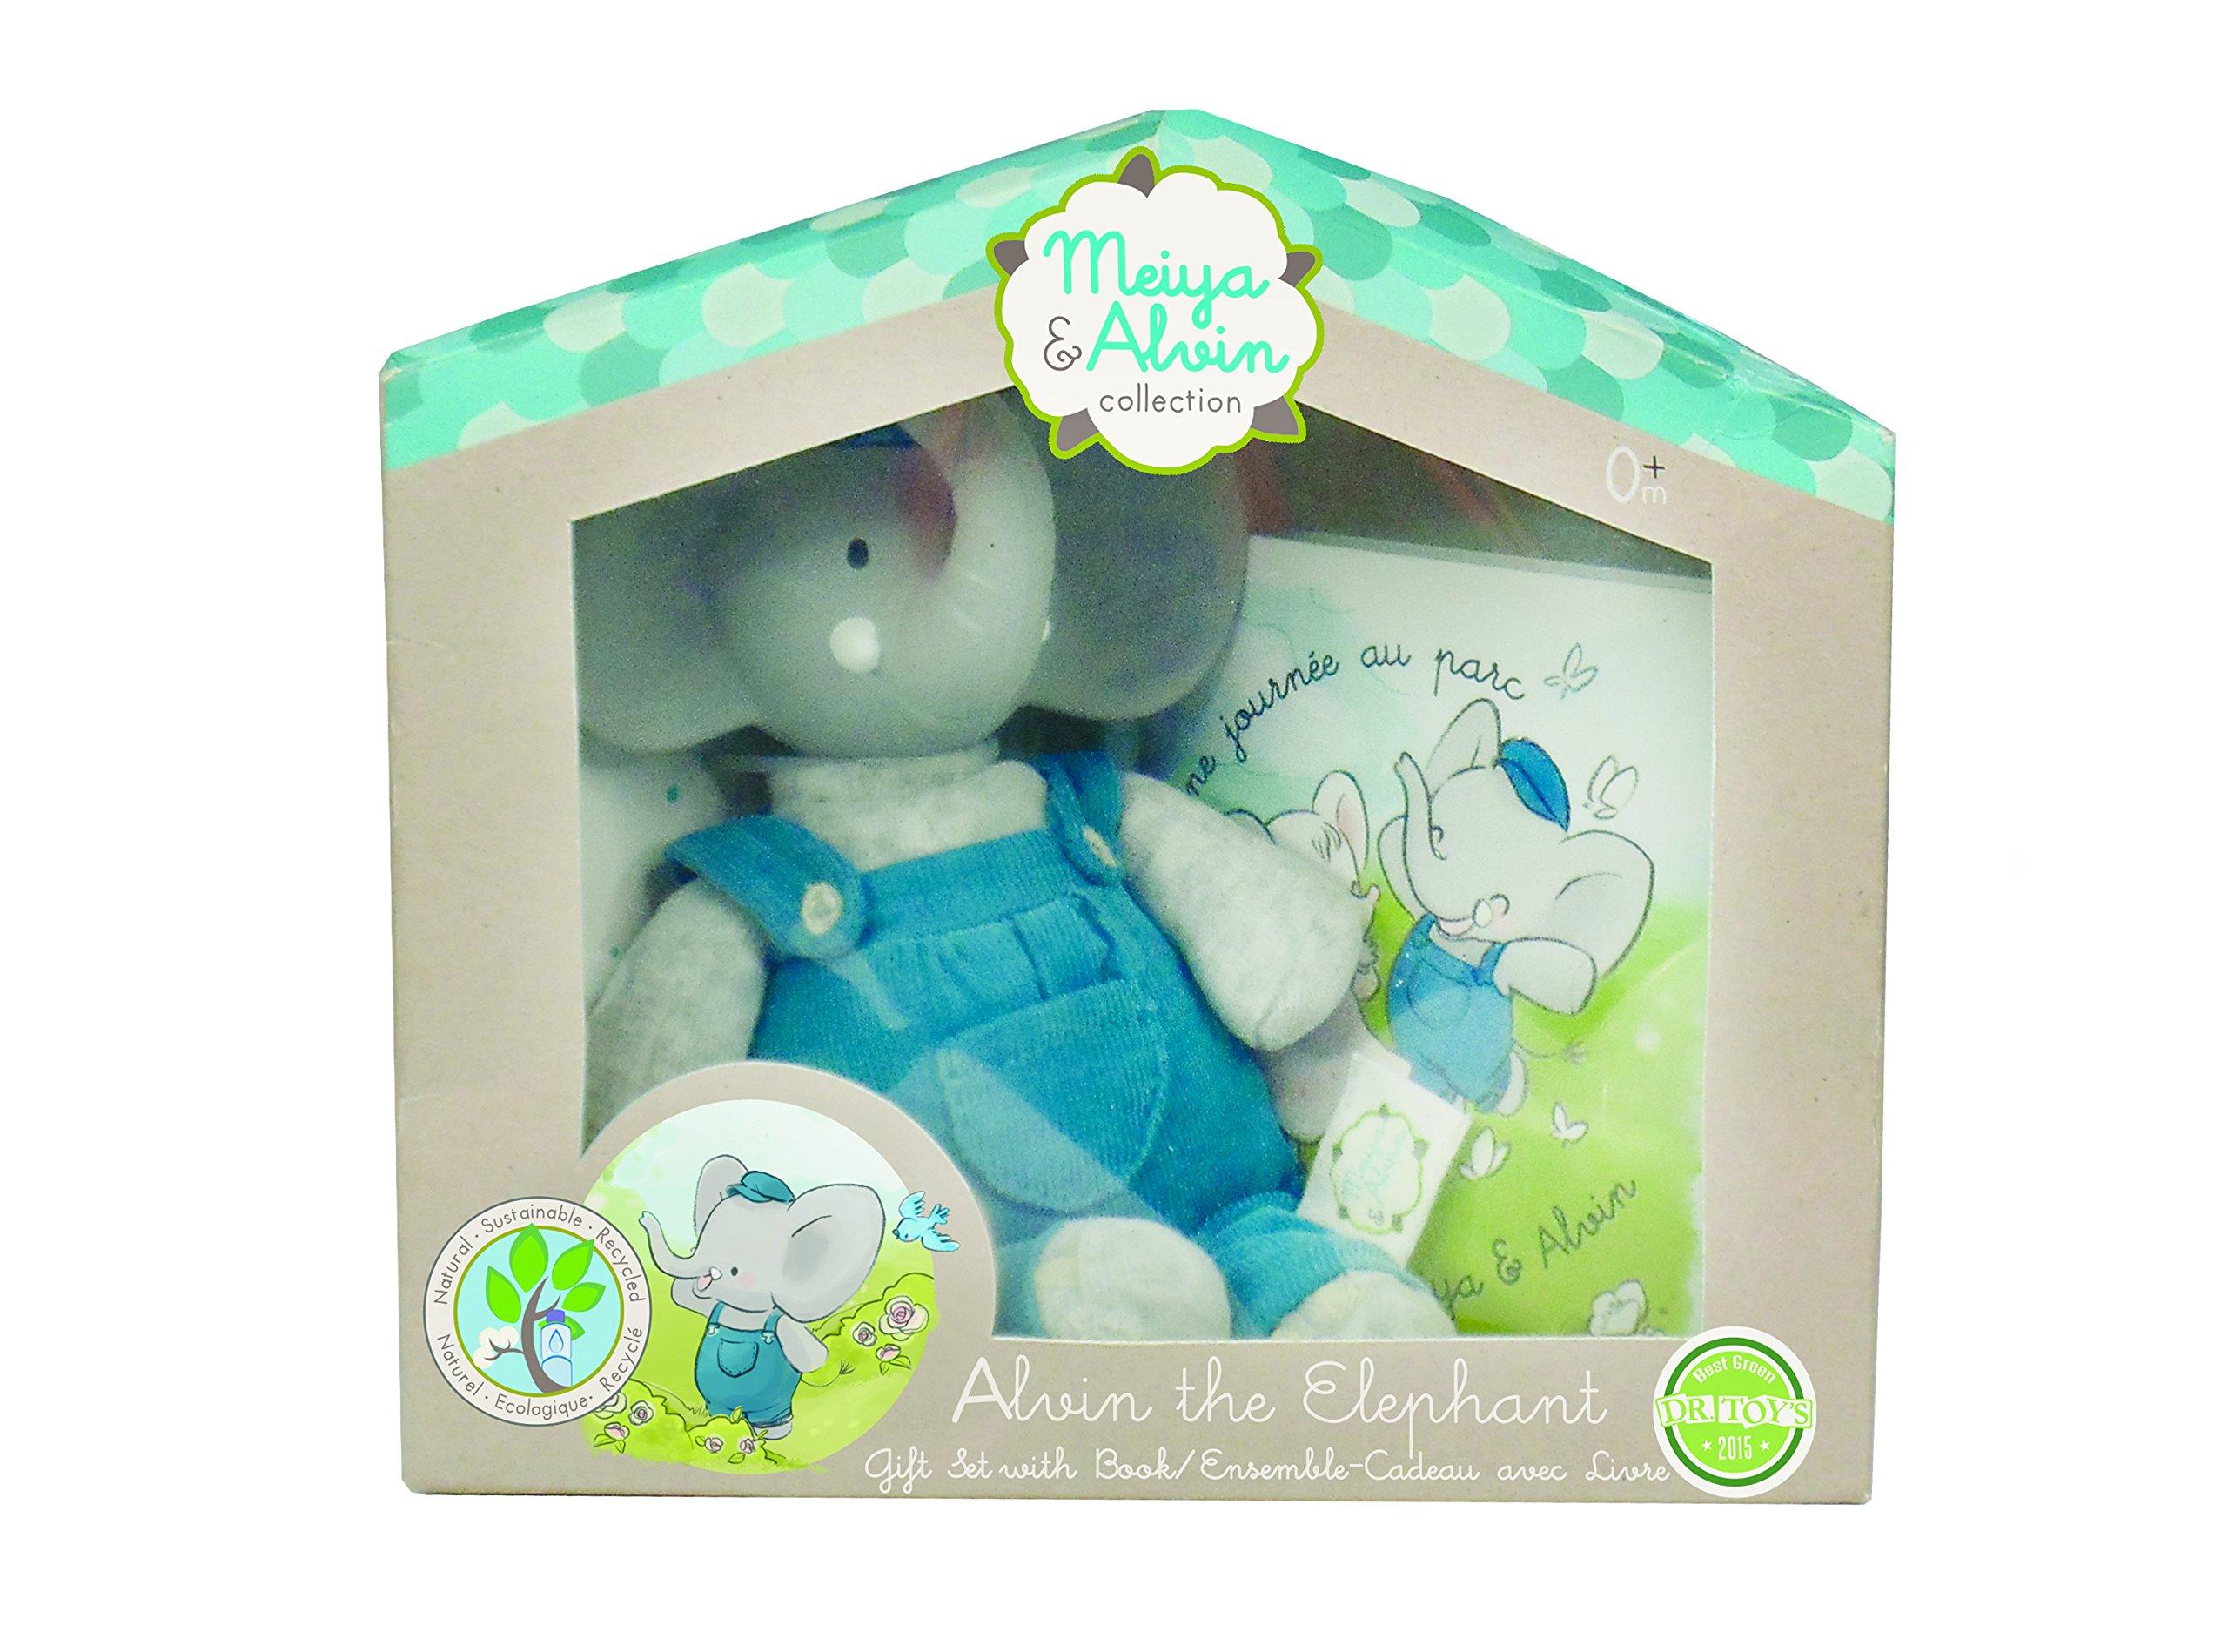 Meiya & Alvin Mini Elephant Gift in Box by Meiya & Alvin